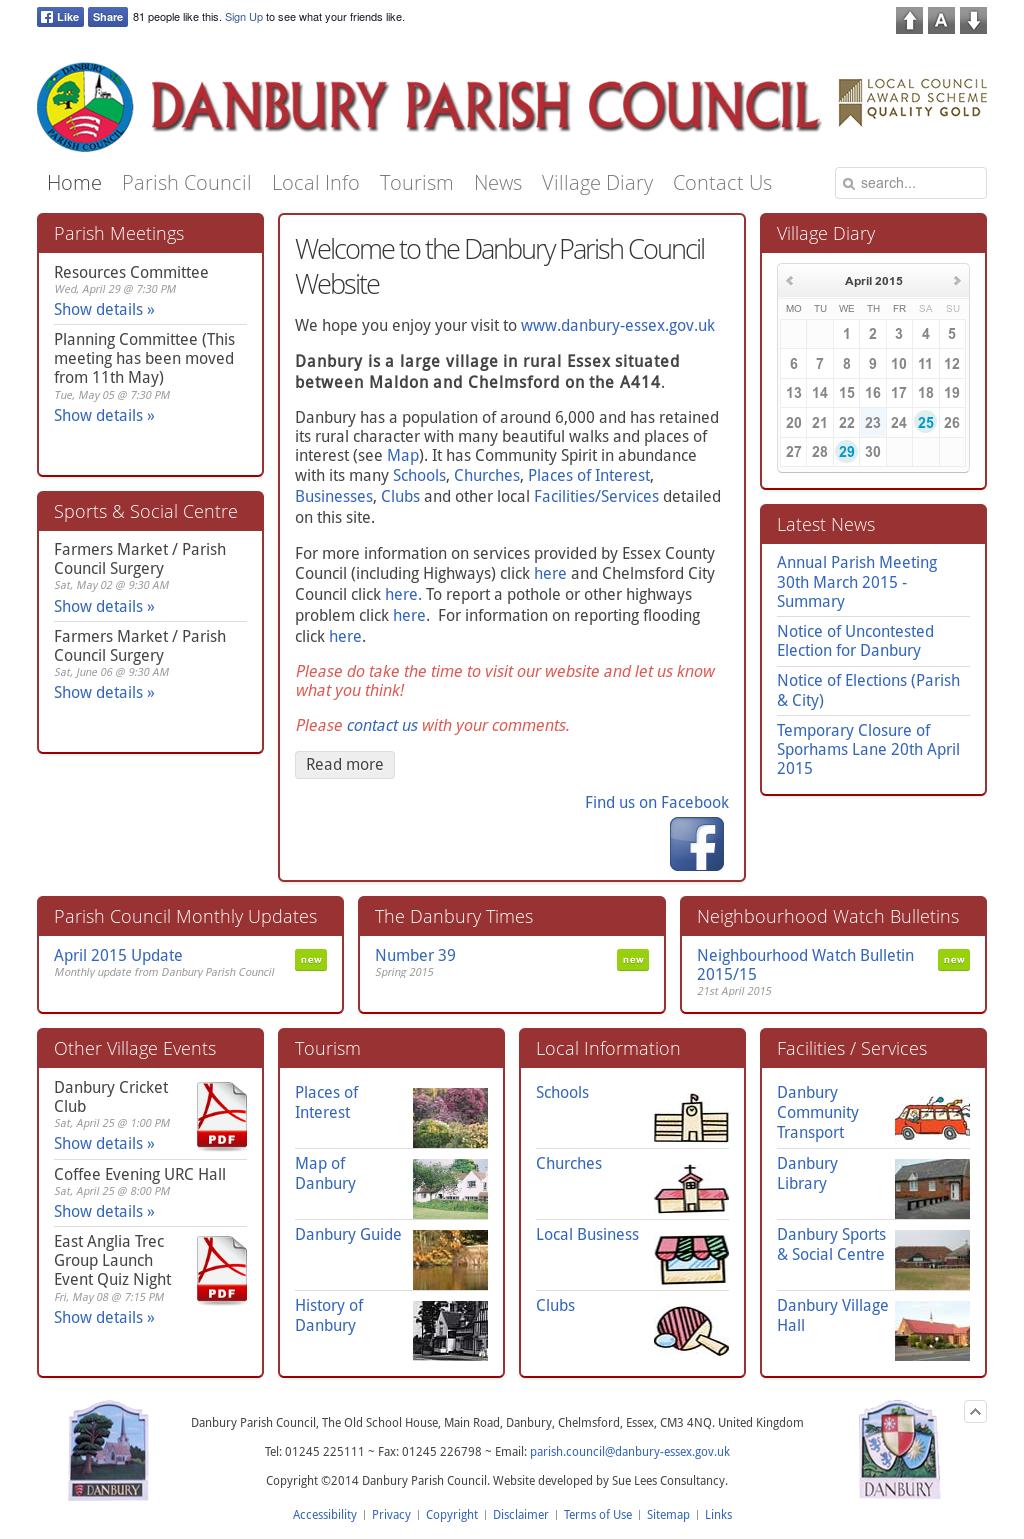 Danbury Parish Council Competitors, Revenue and Employees - Owler